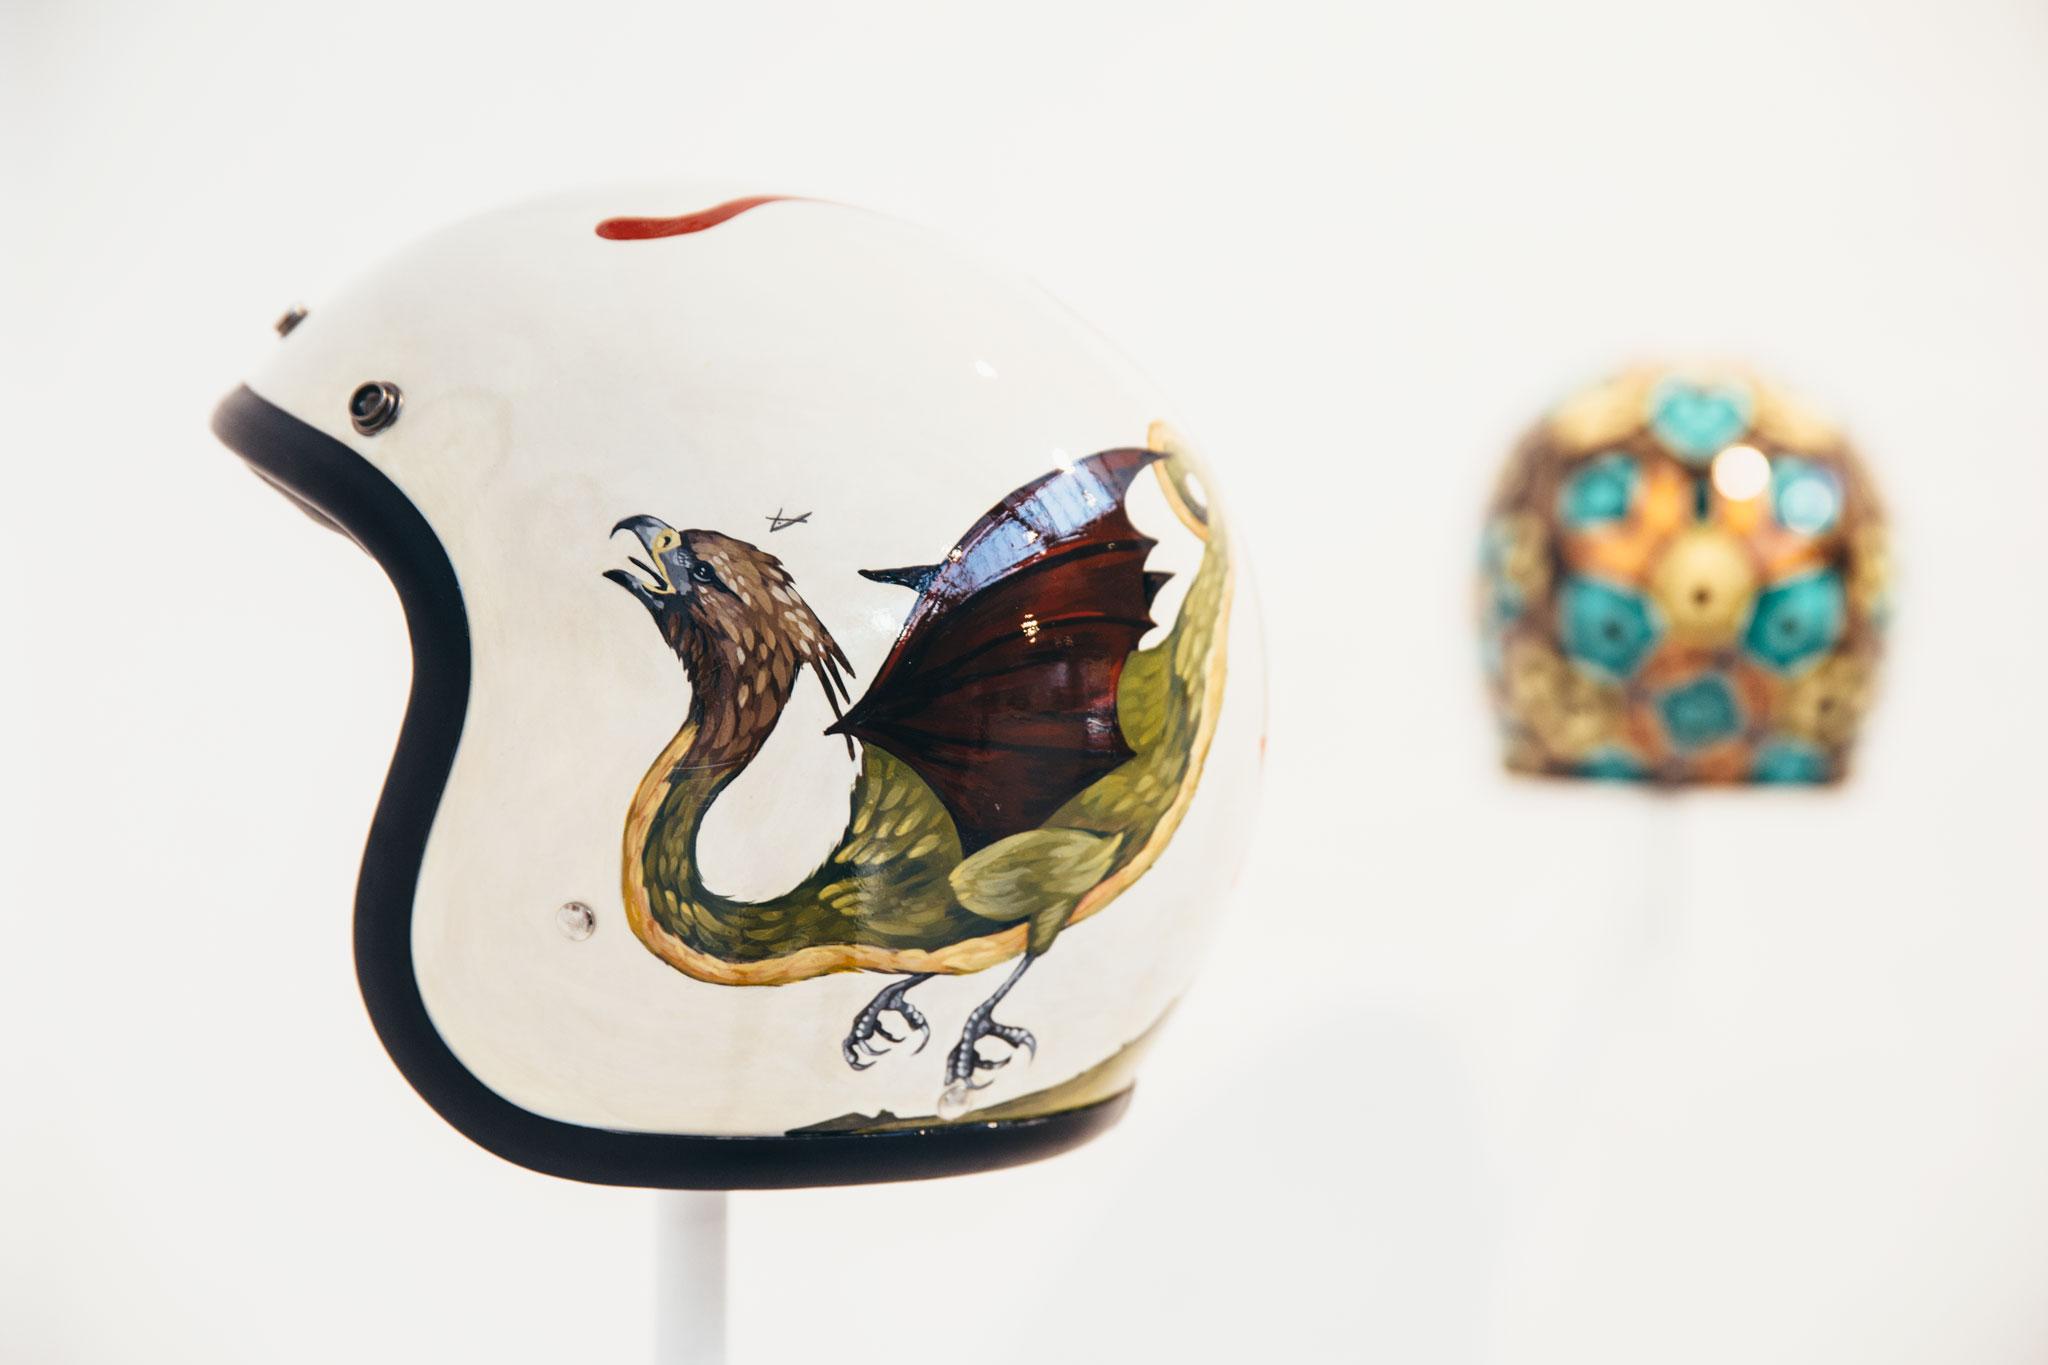 Art Pharamacy_Vandal Gallery_Sabotage MotorcyclesTwenty20_exhibition_5475.jpg